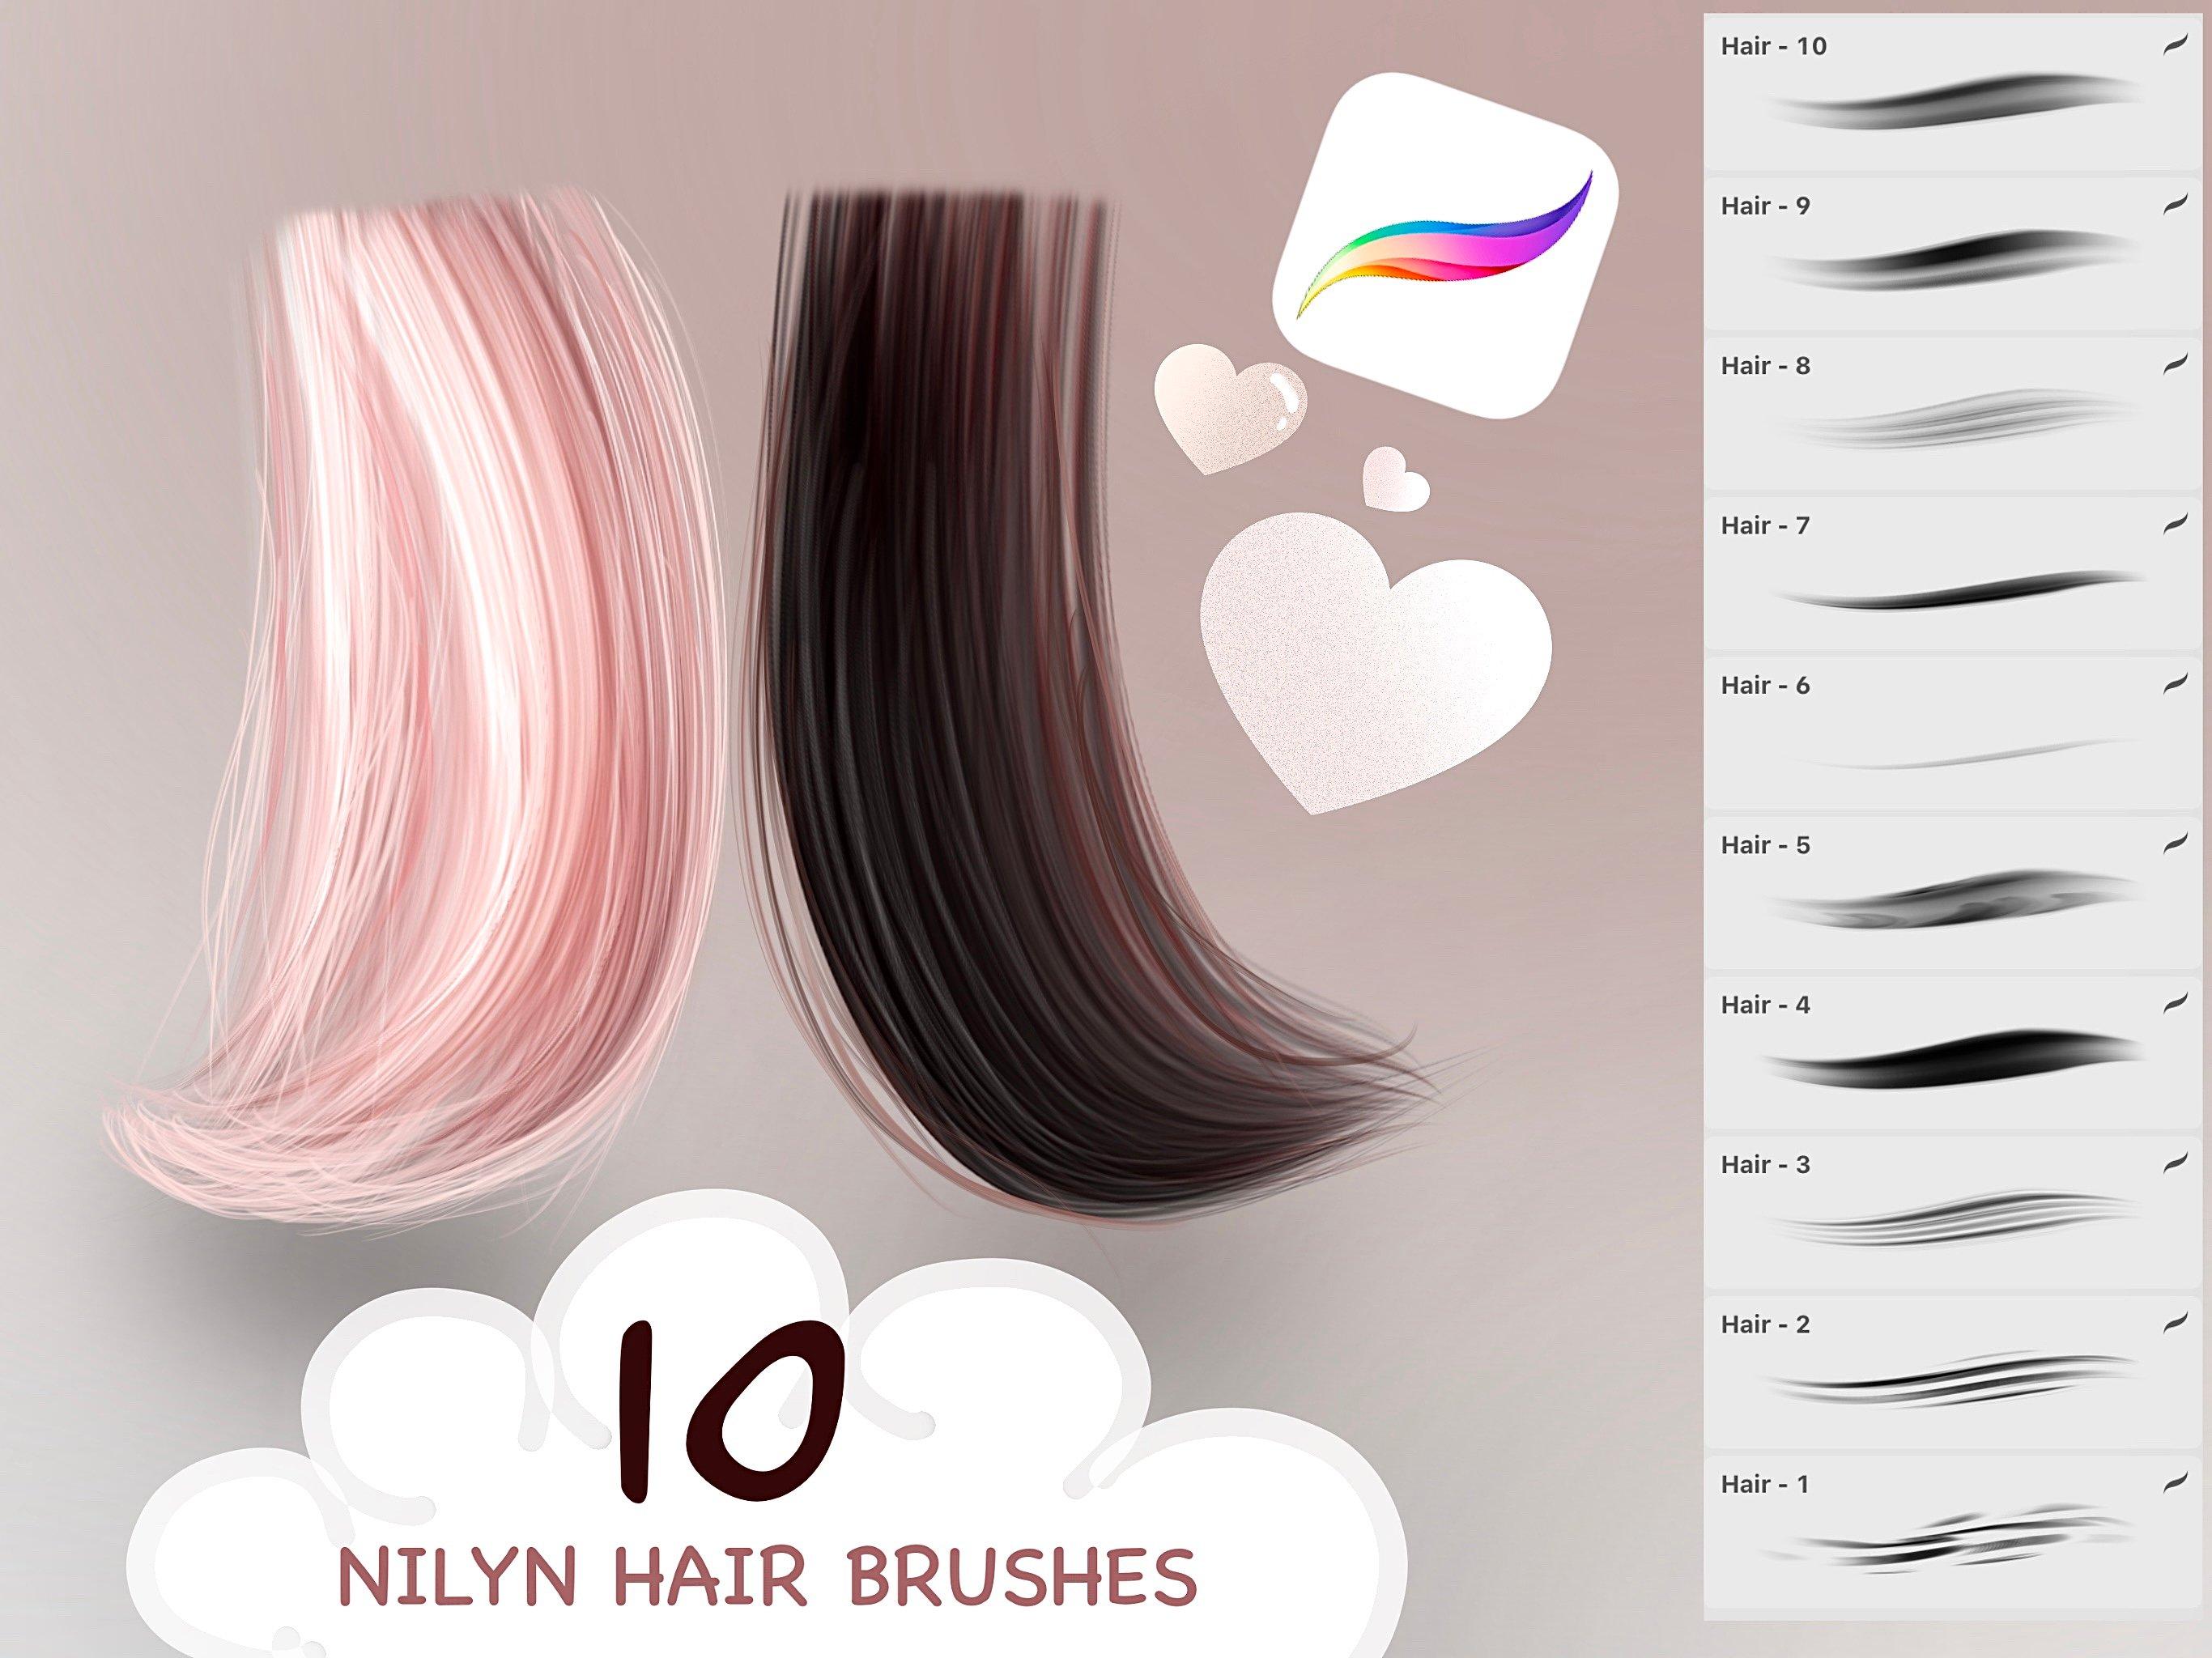 Nilyn Procreate - 10 Hair Brushes set ver.3 FREE